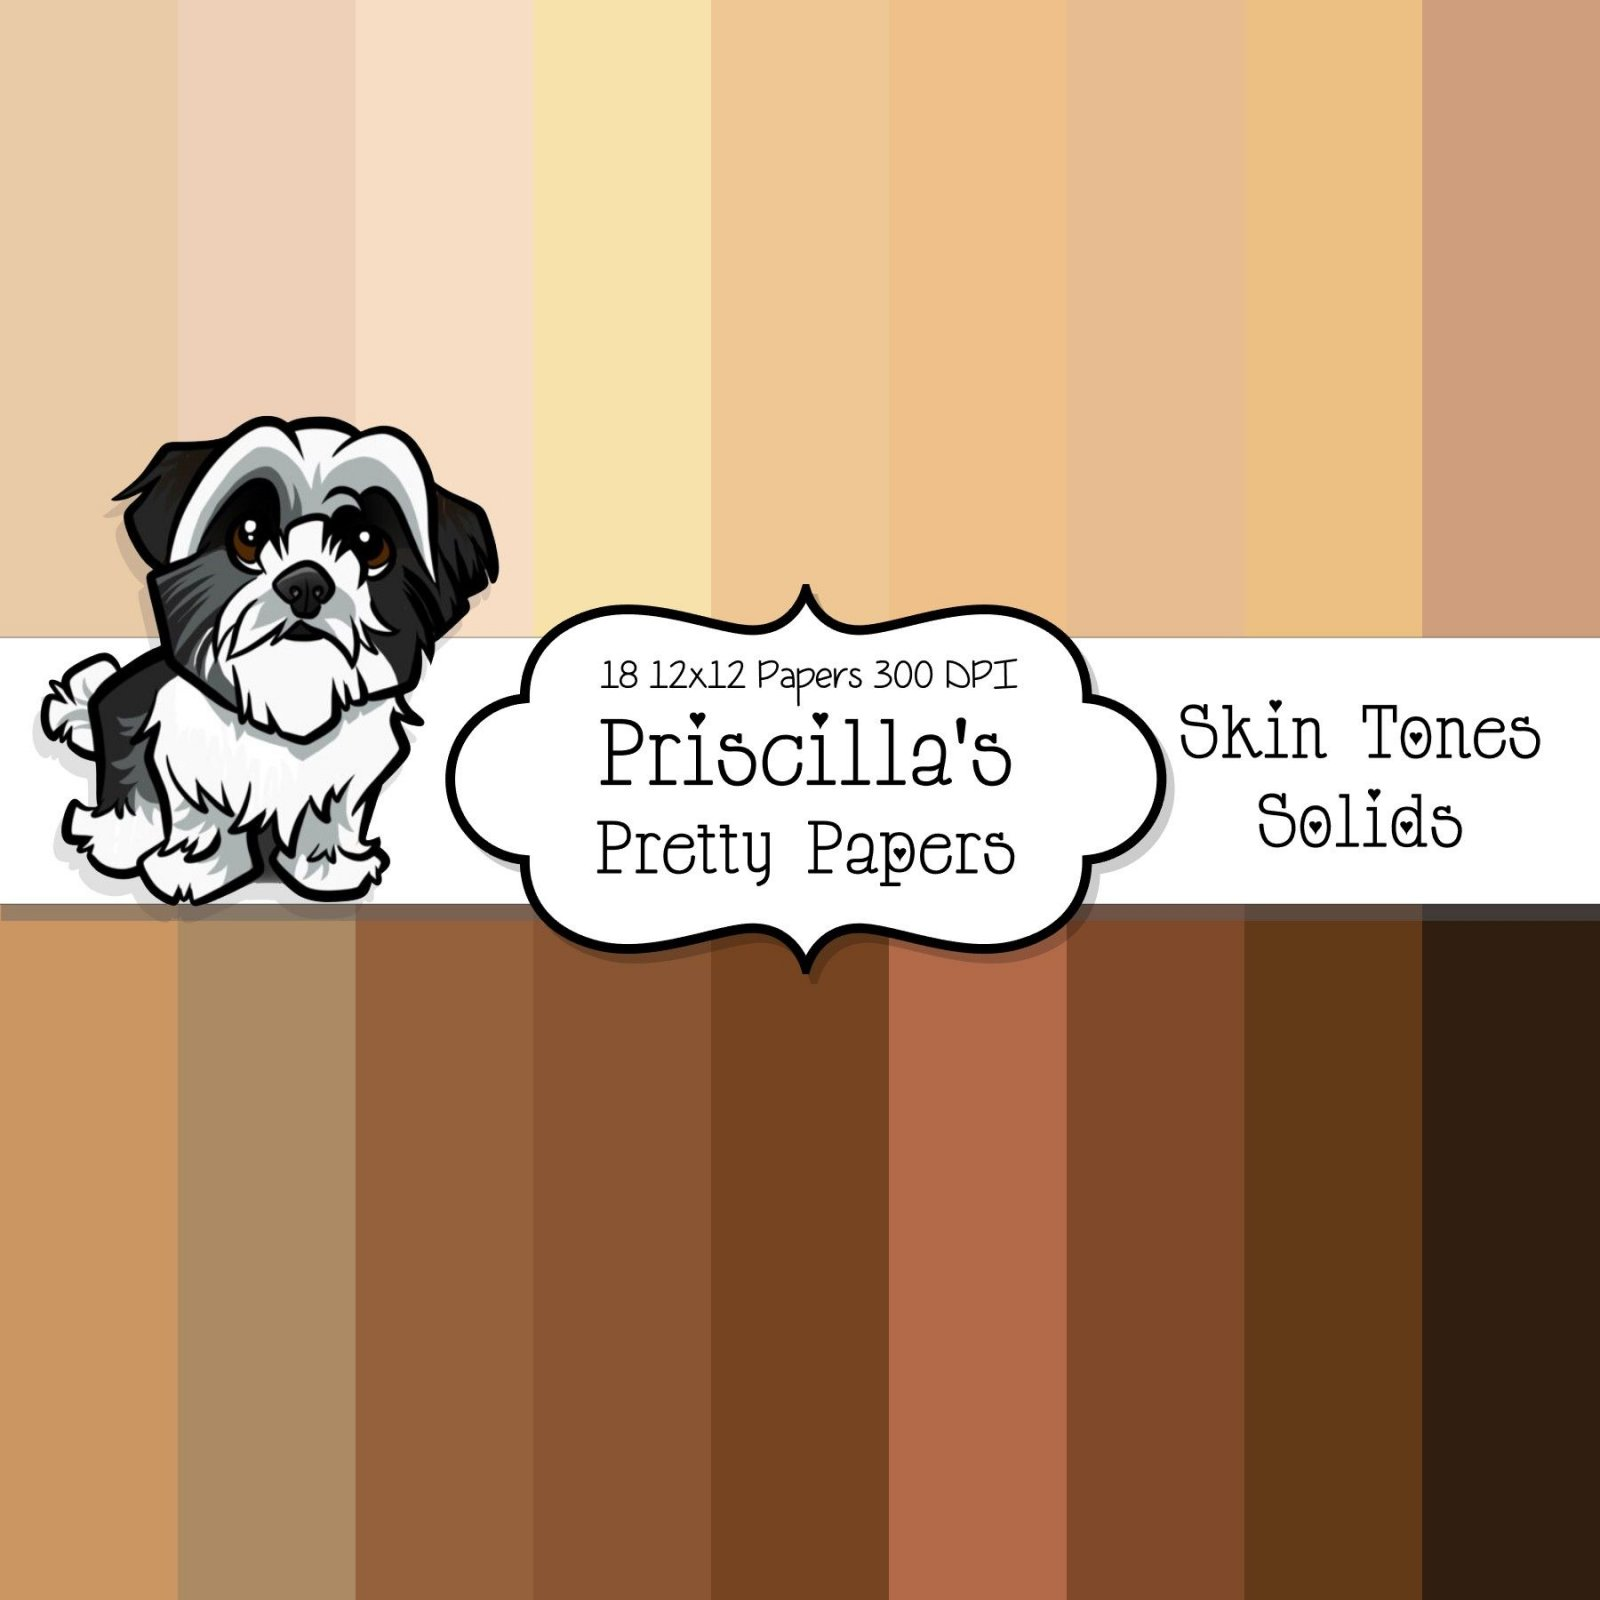 Skin Tones - Solid digital download